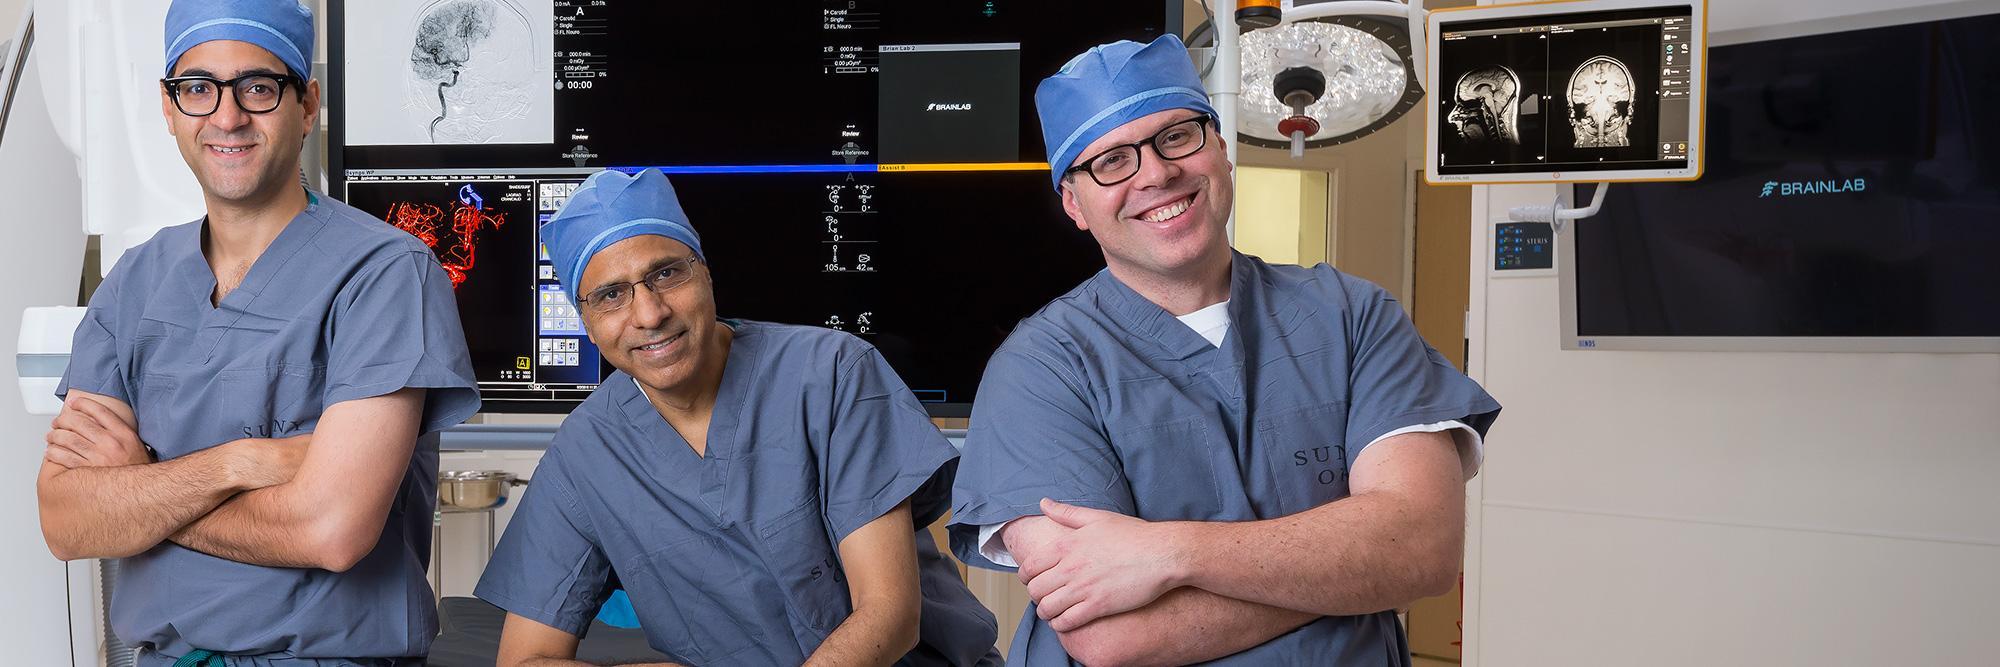 Department of Neurosurgery | SUNY Upstate Medical University